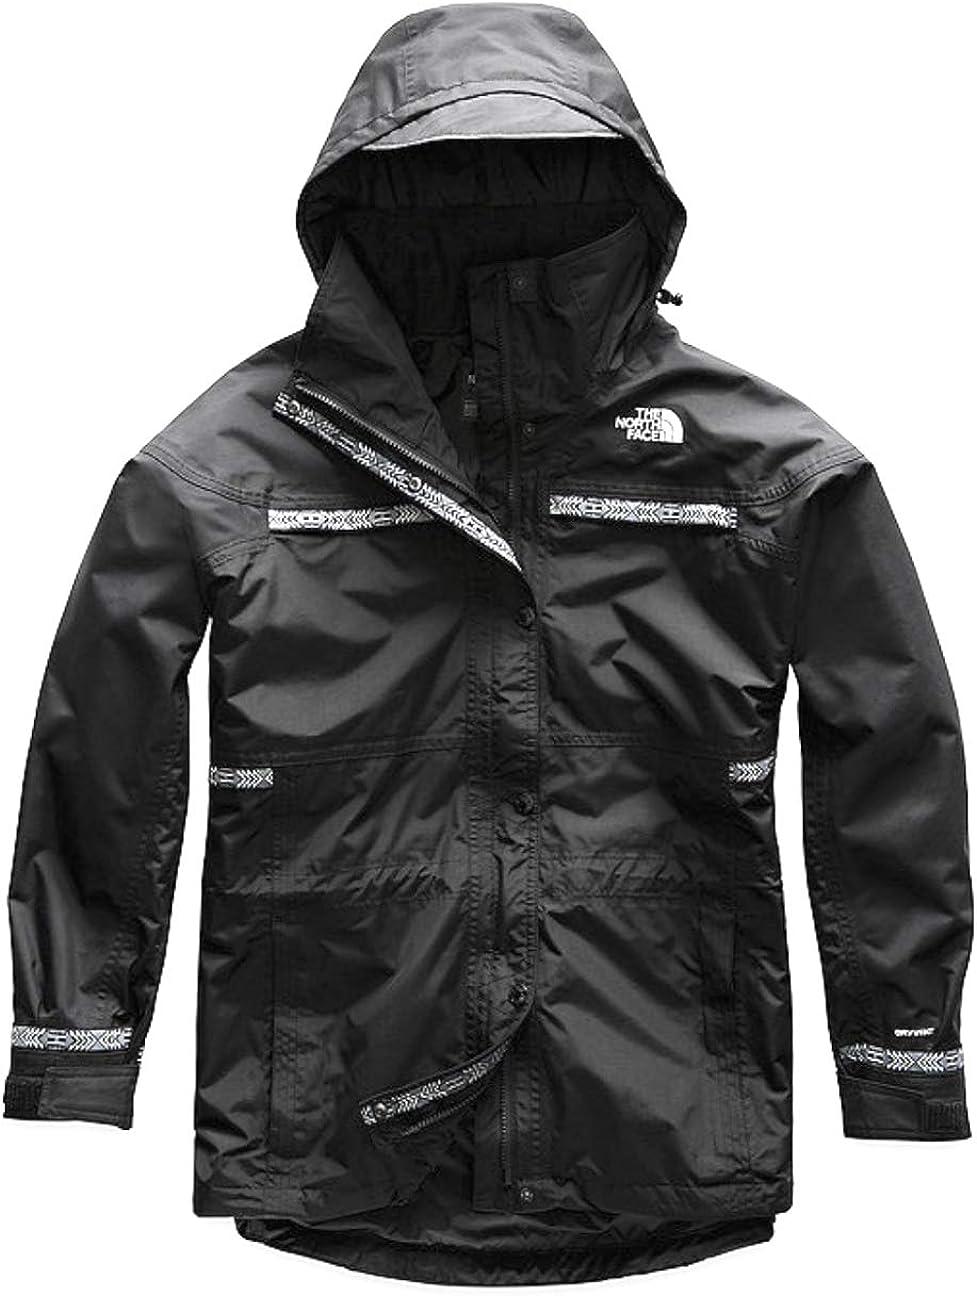 The North Face Mens 92 Retro Rage Rain Jacket in Black XX-Large